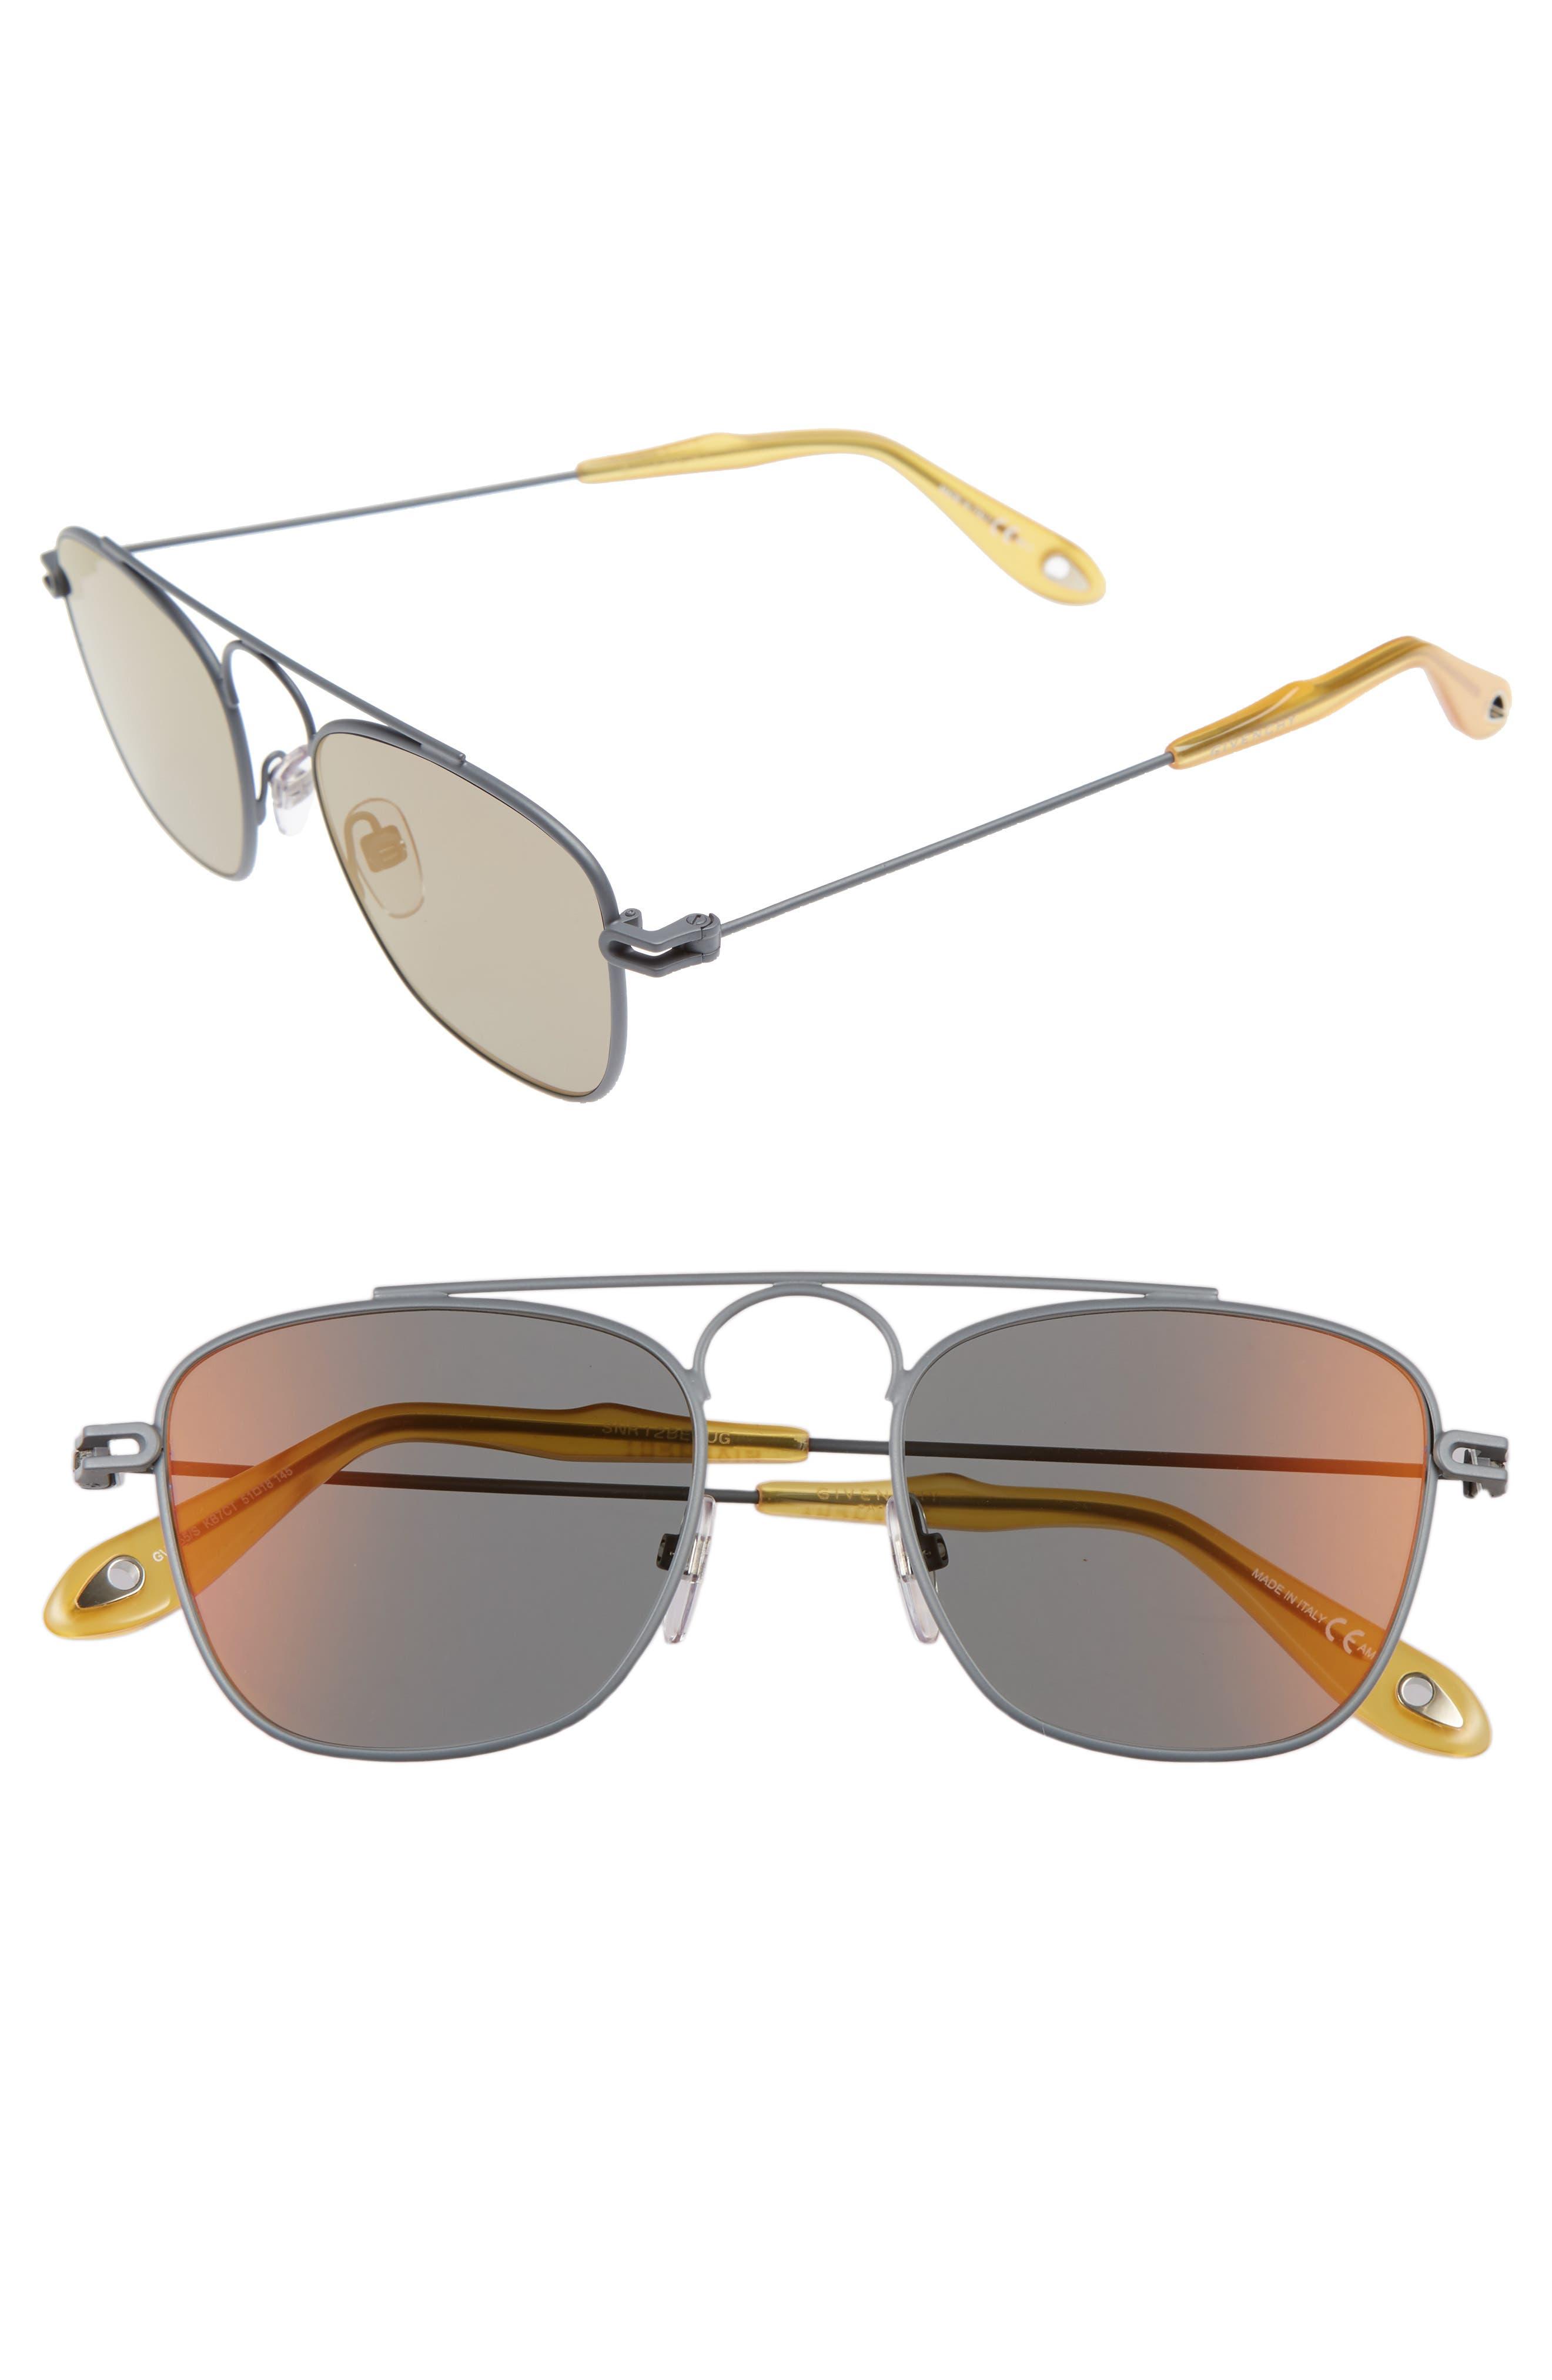 Givenchy 51mm Navigator Sunglasses